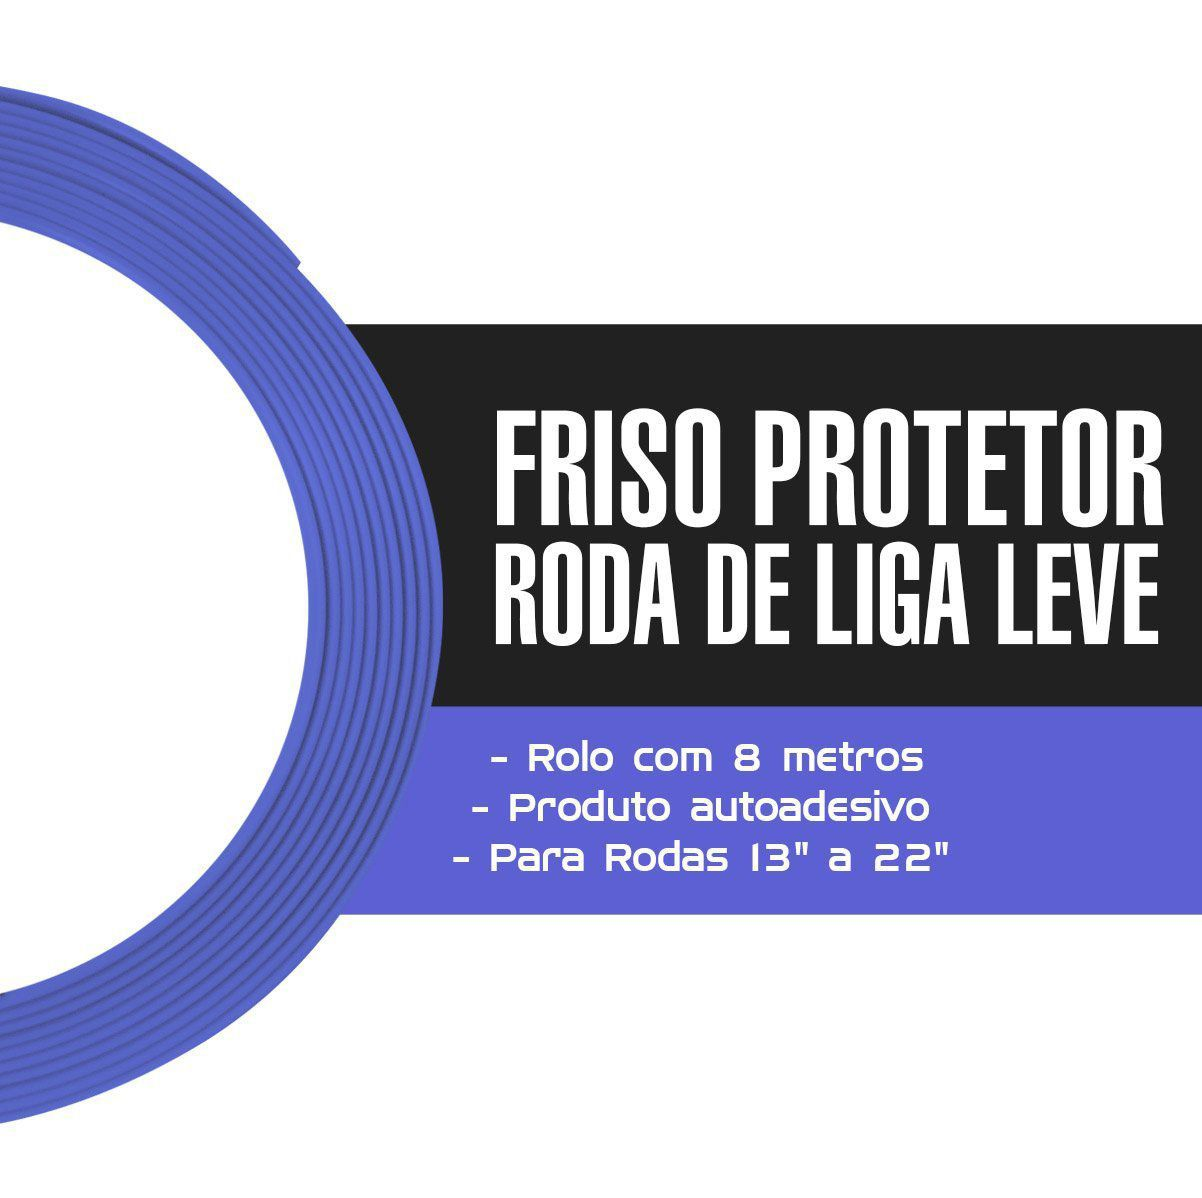 Friso Protetor Roda Liga Leve Esportiva Tuning 8m - Lilás